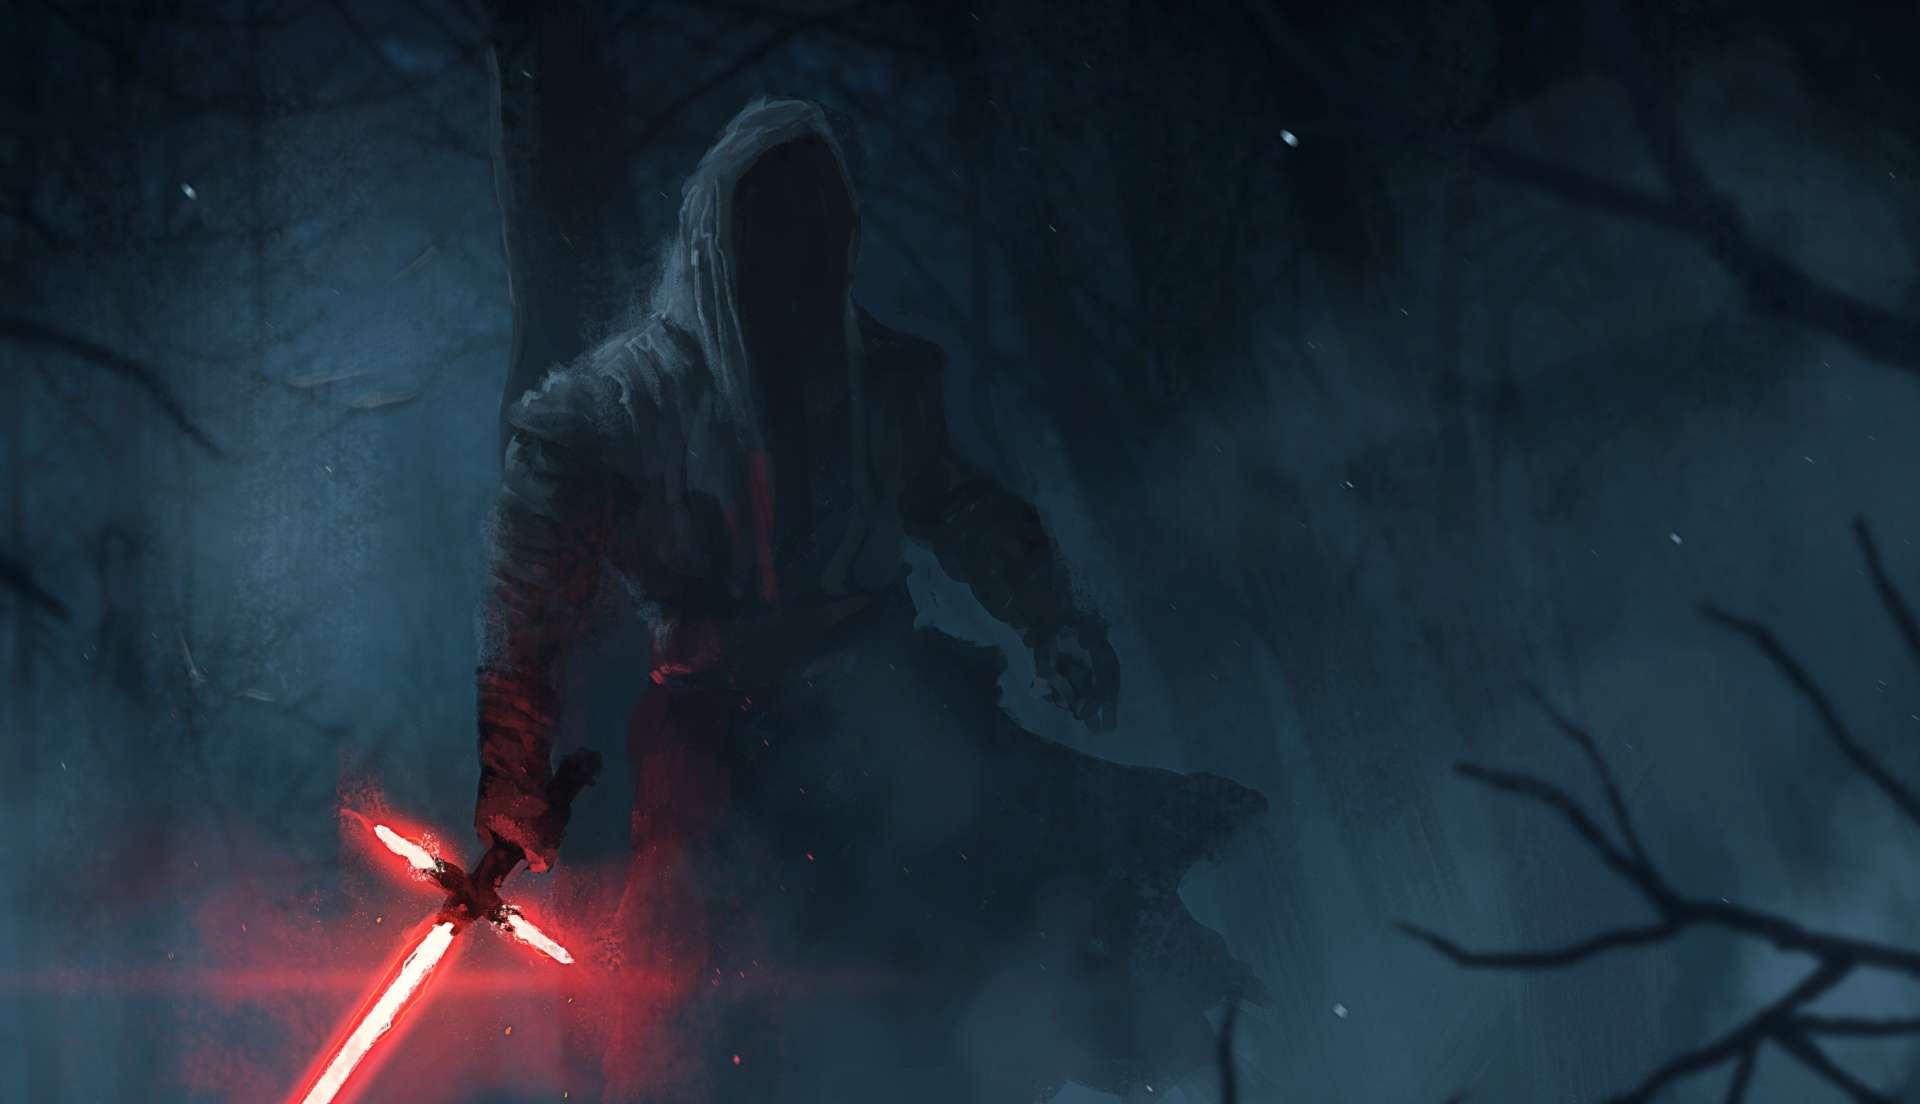 Star Wars Episode VII The Force Awakens Wallpaper 008